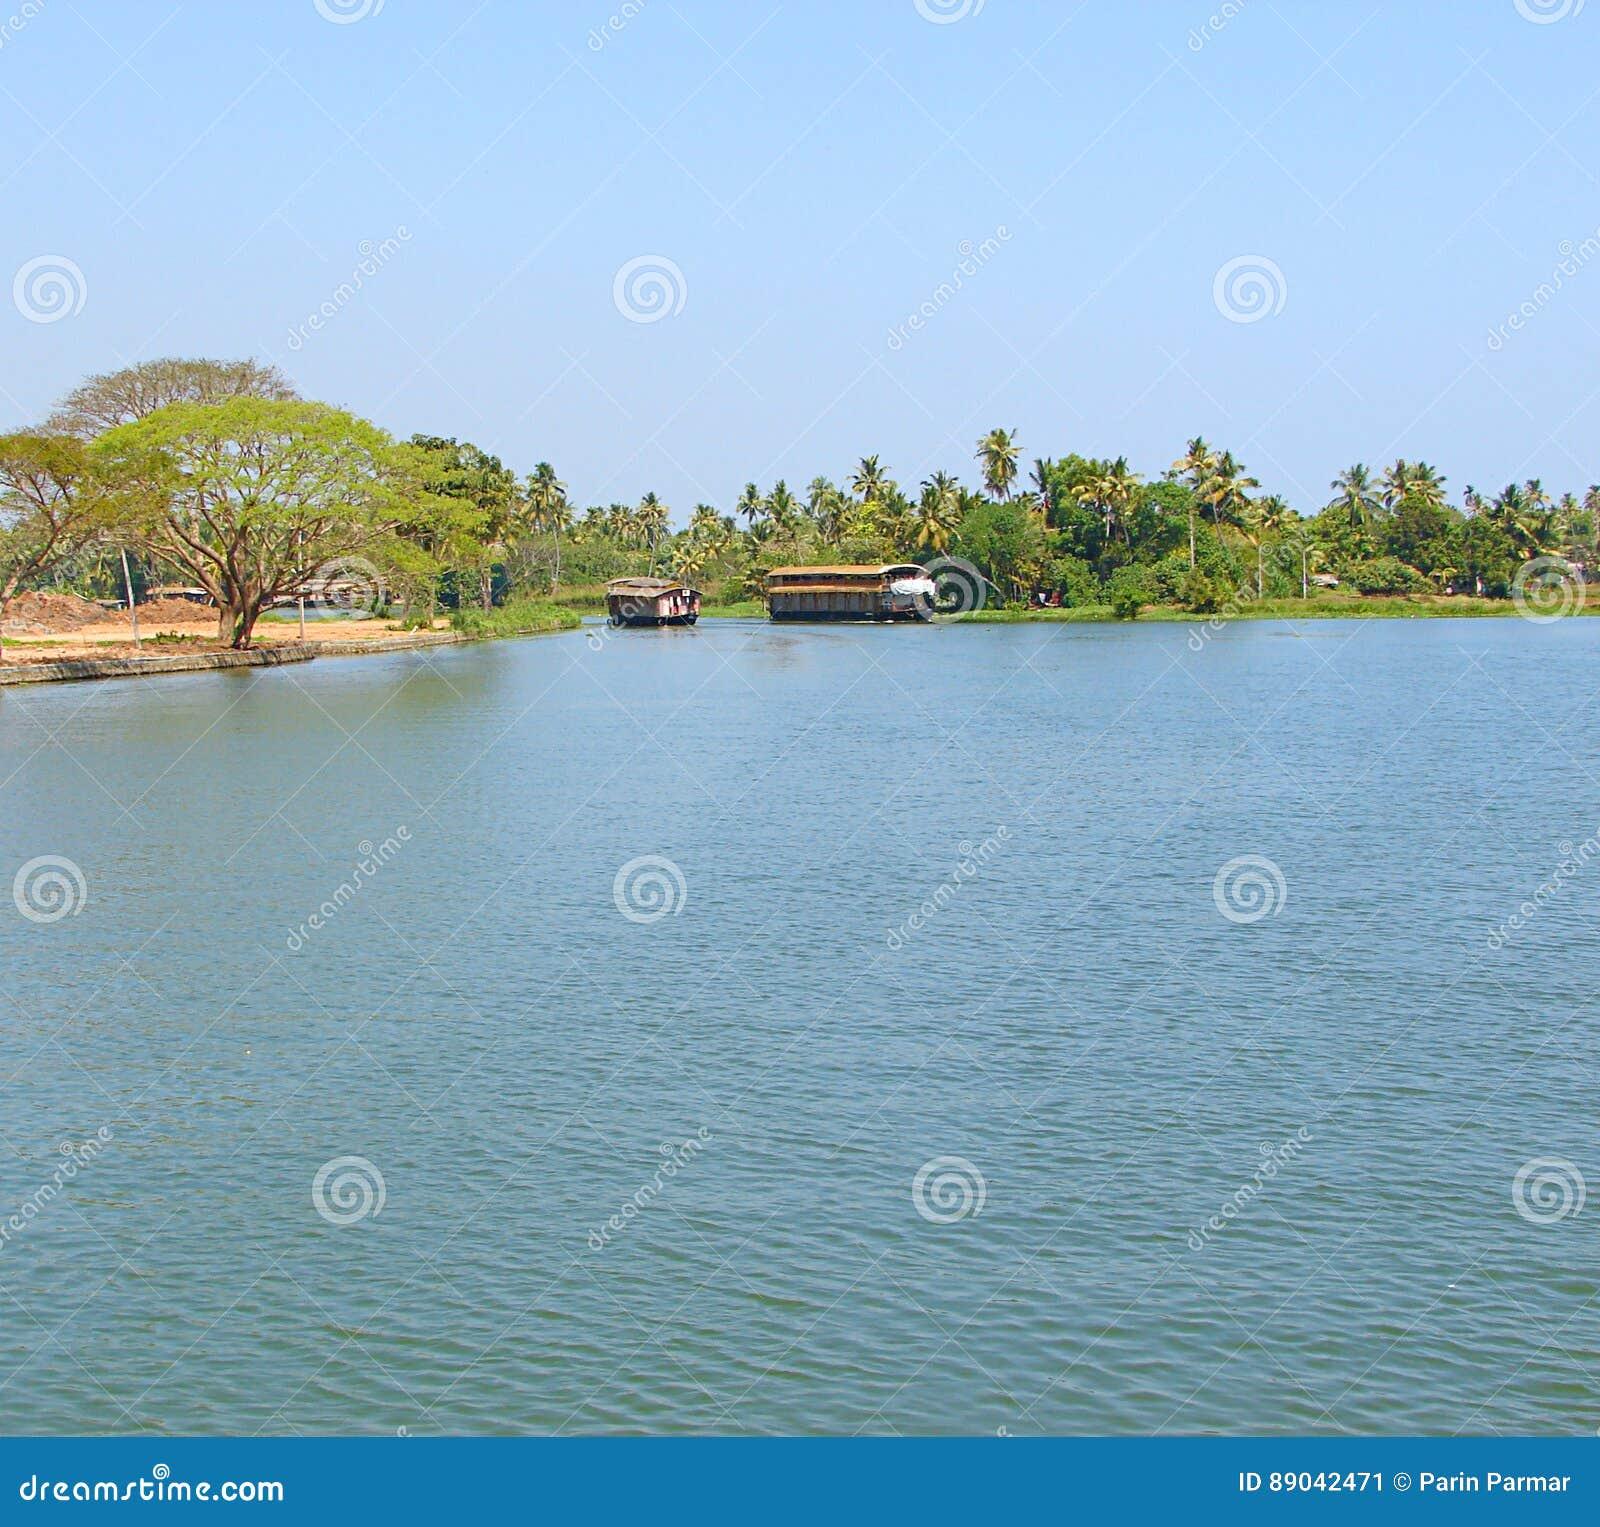 Houseboats In Backwaters In Kerala, India Stock Image